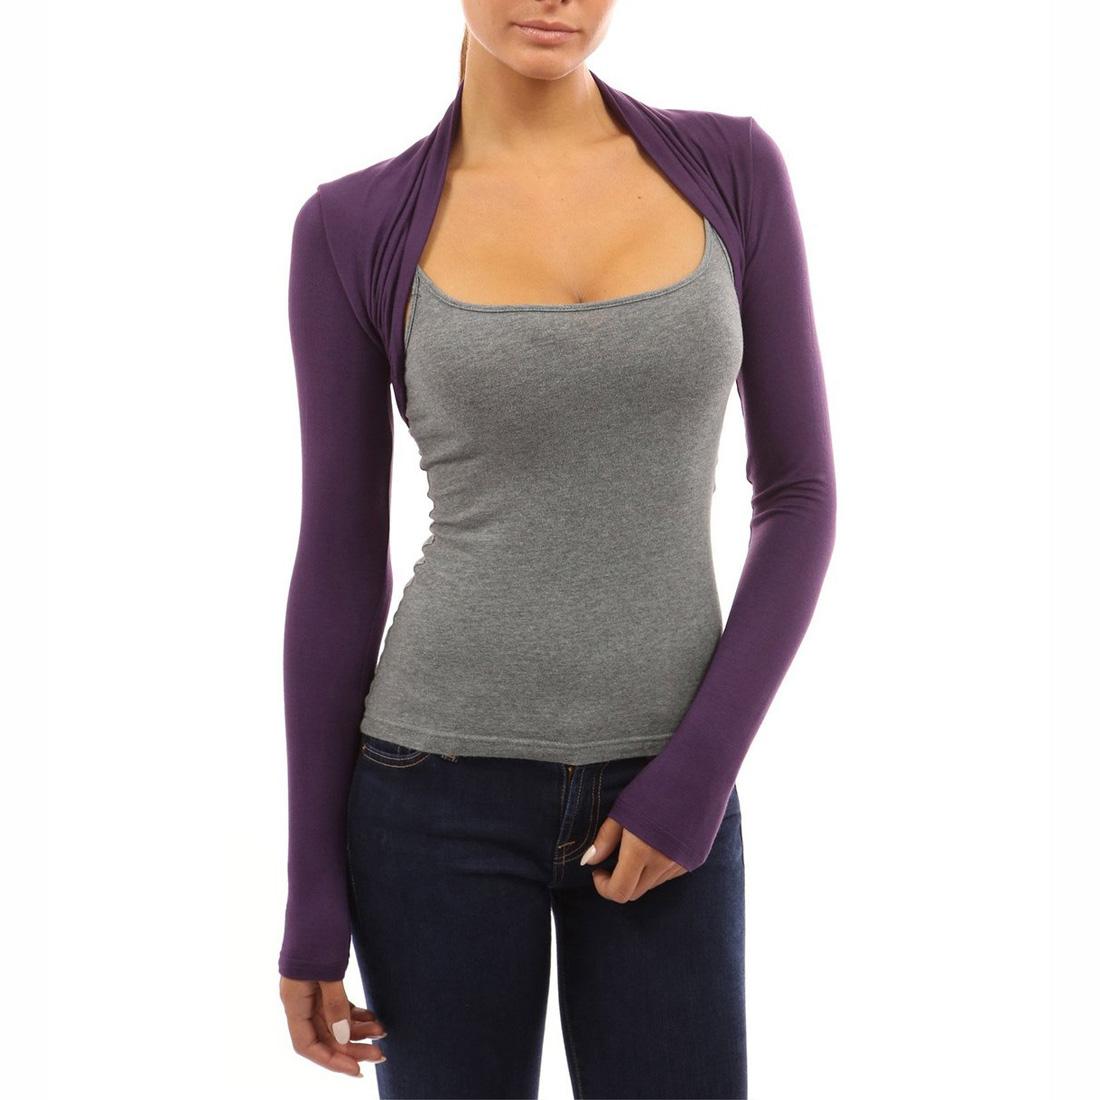 337661f207 Womens Ladies Cardigan Top Plain Jumpers Long Sleeve Shrug Bolero ...